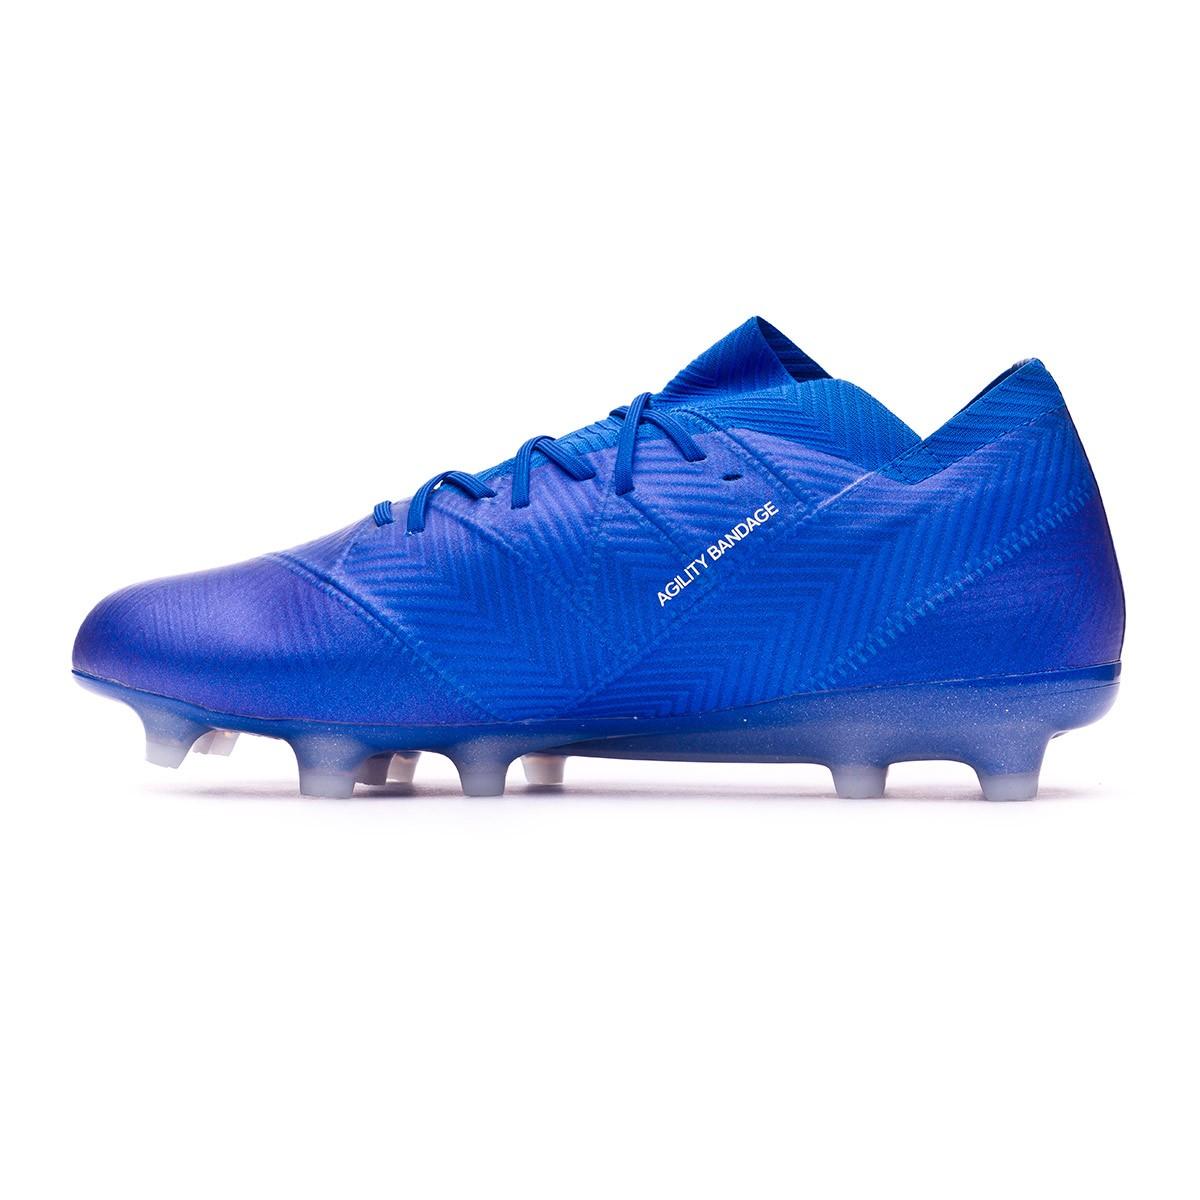 competitive price 02408 0ebe4 Football Boots adidas Nemeziz 18.1 FG Football blue-White - Football store  Fútbol Emotion